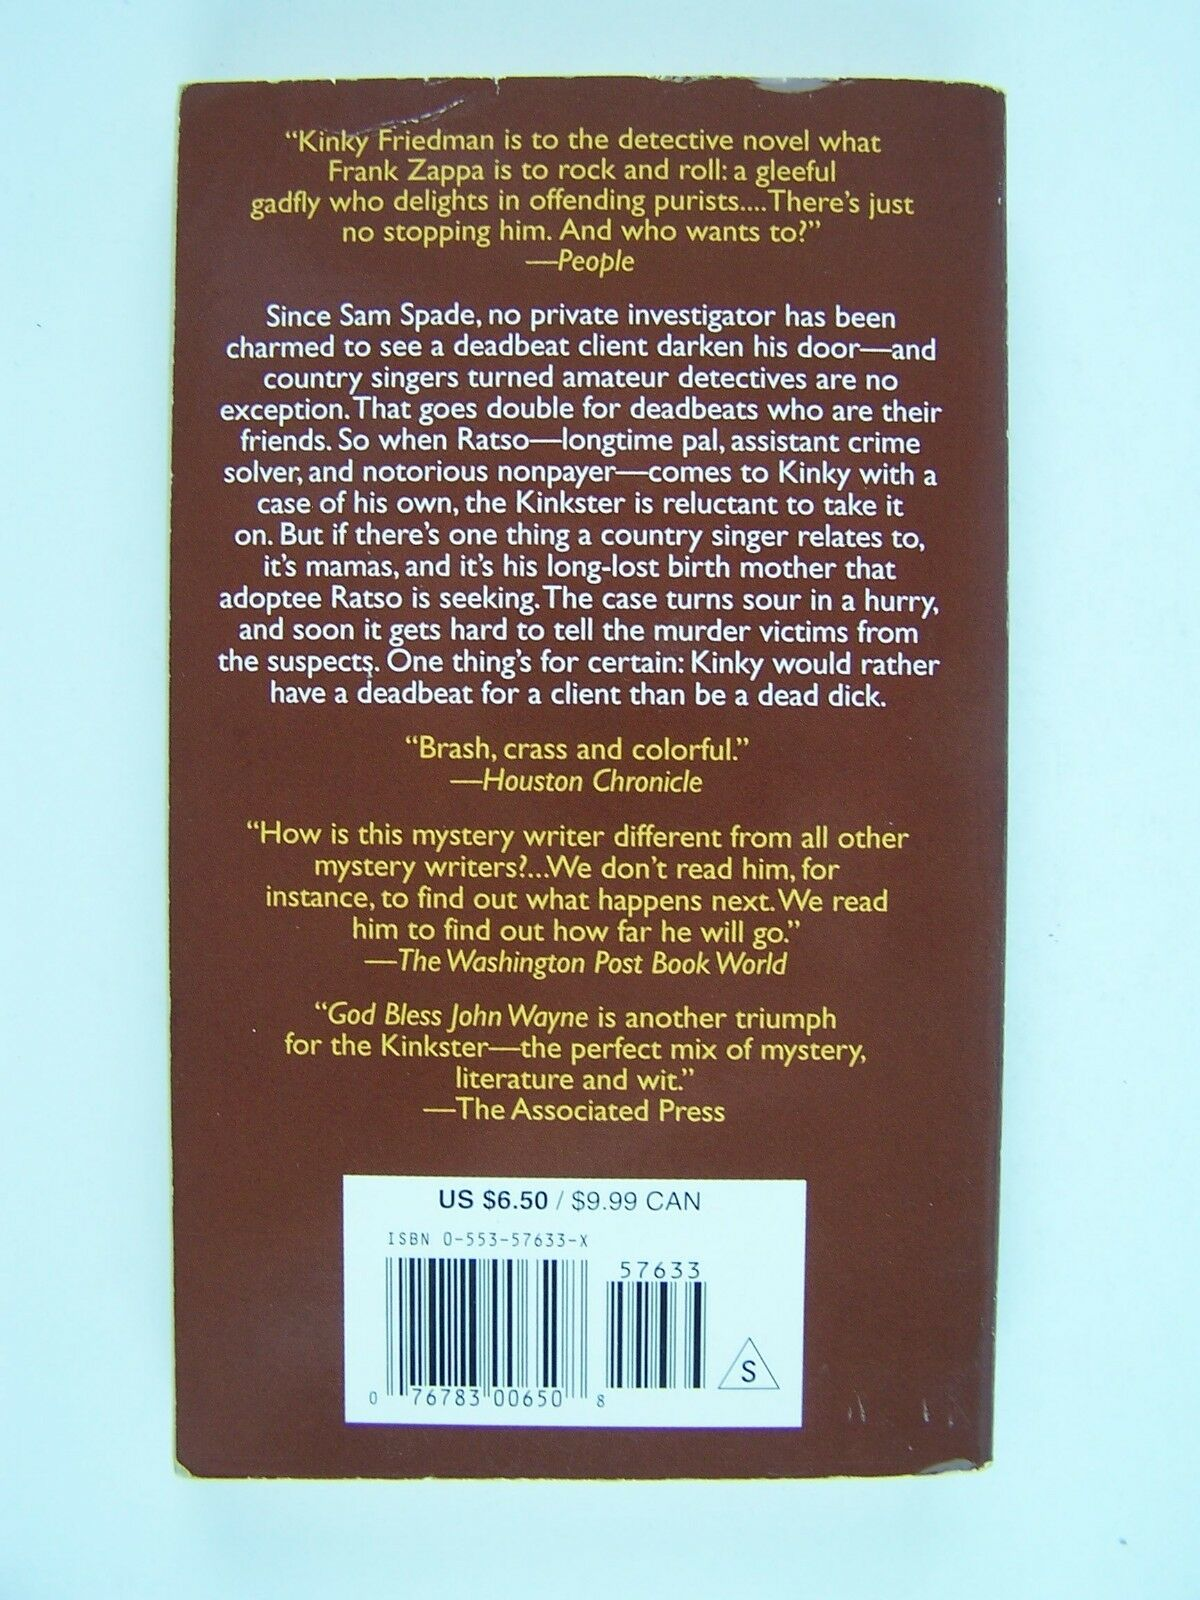 God Bless John Wayne A Novel Kinky Friedman Novels Mass